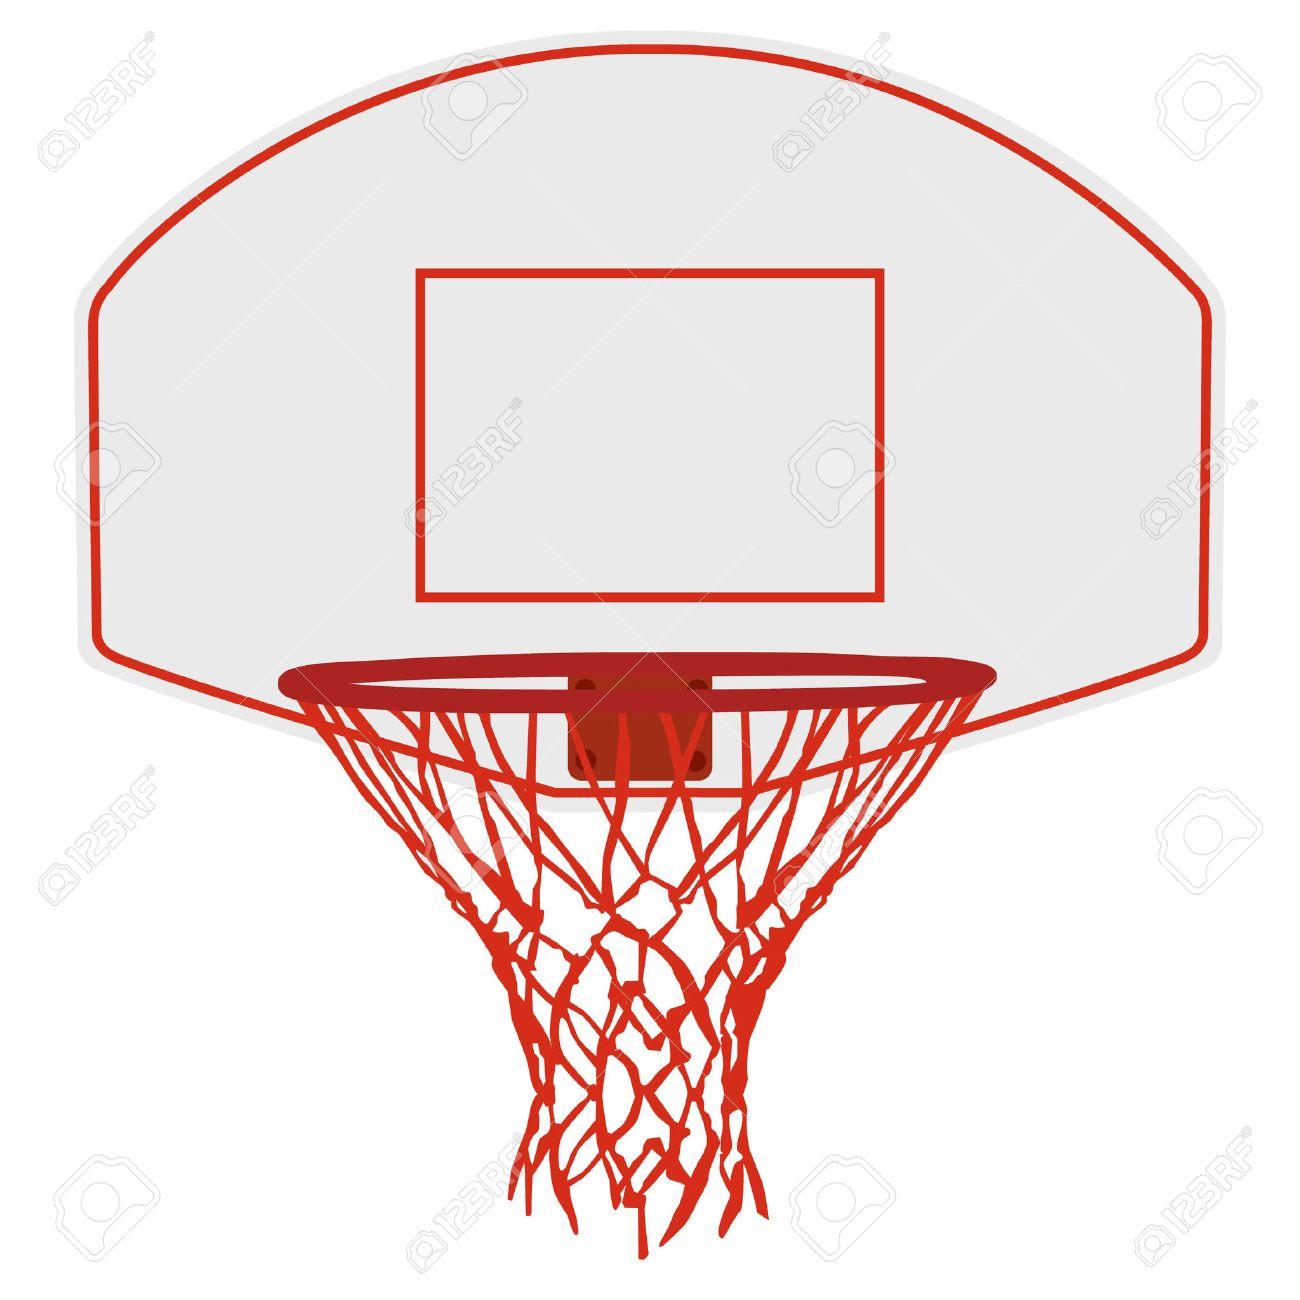 vector illustration basketball basket basketball hoop basketball